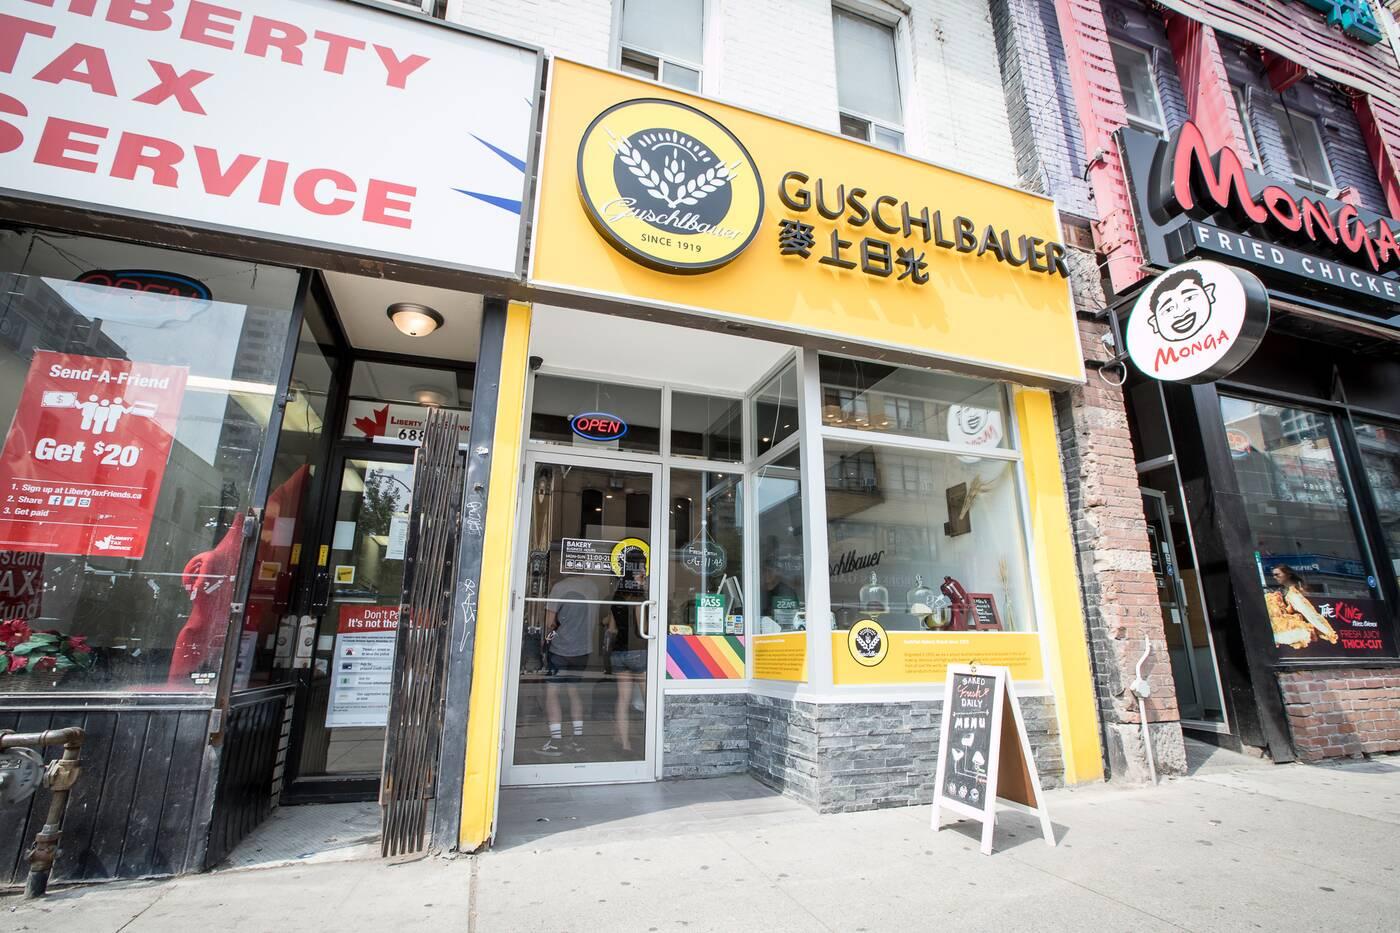 Guschlbauer Toronto